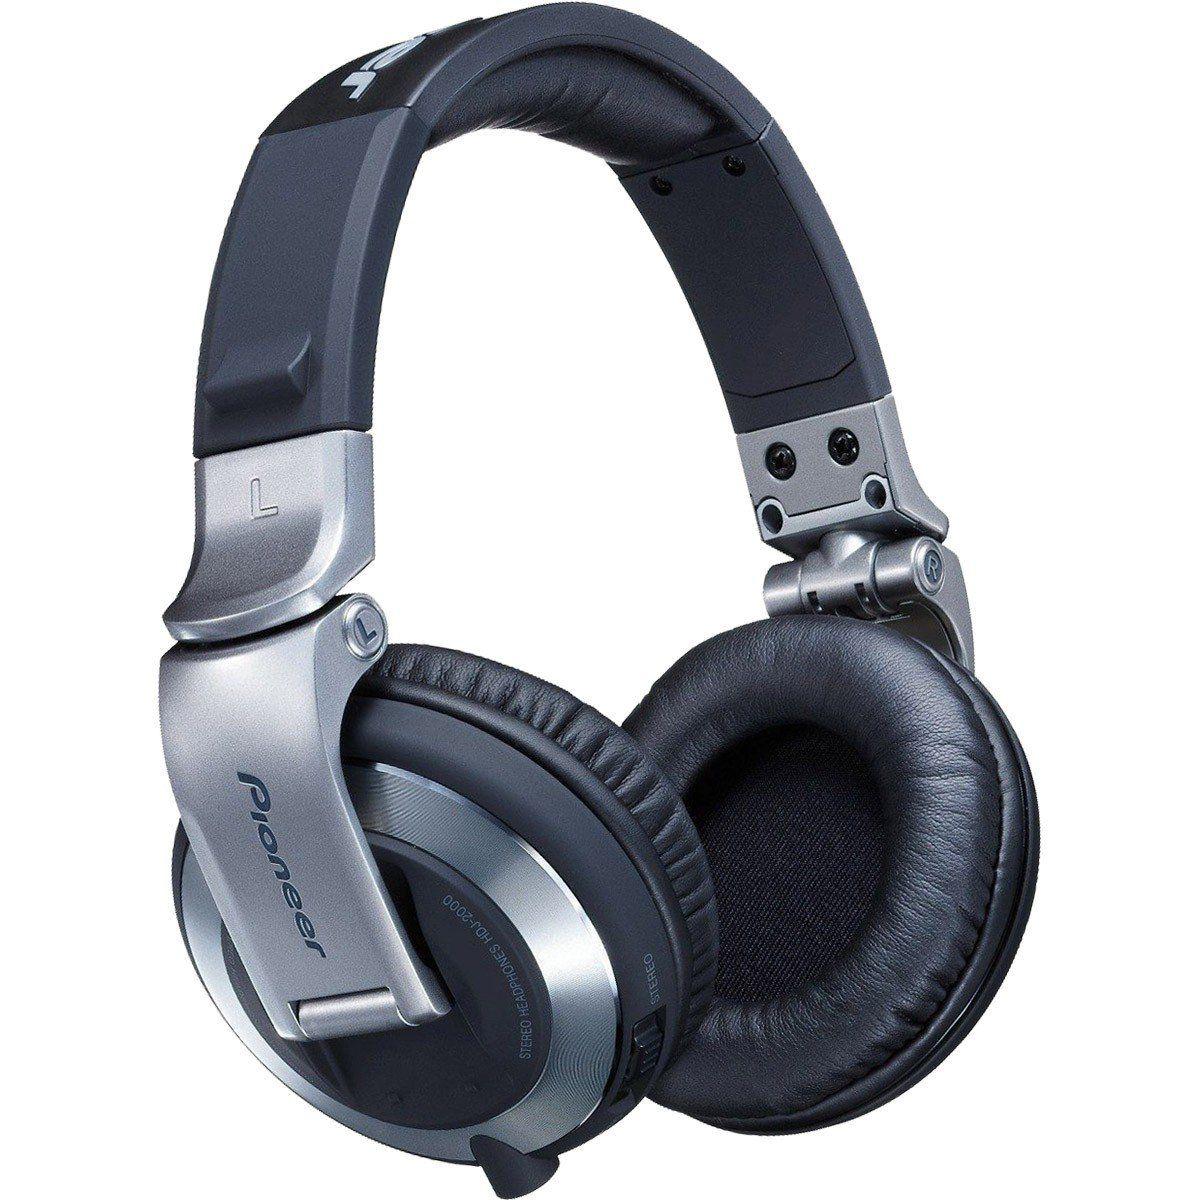 Pioneer HDJ-2000 Fone de Ouvido HDJ2000 Fechado Para DJ Profissional Confortável